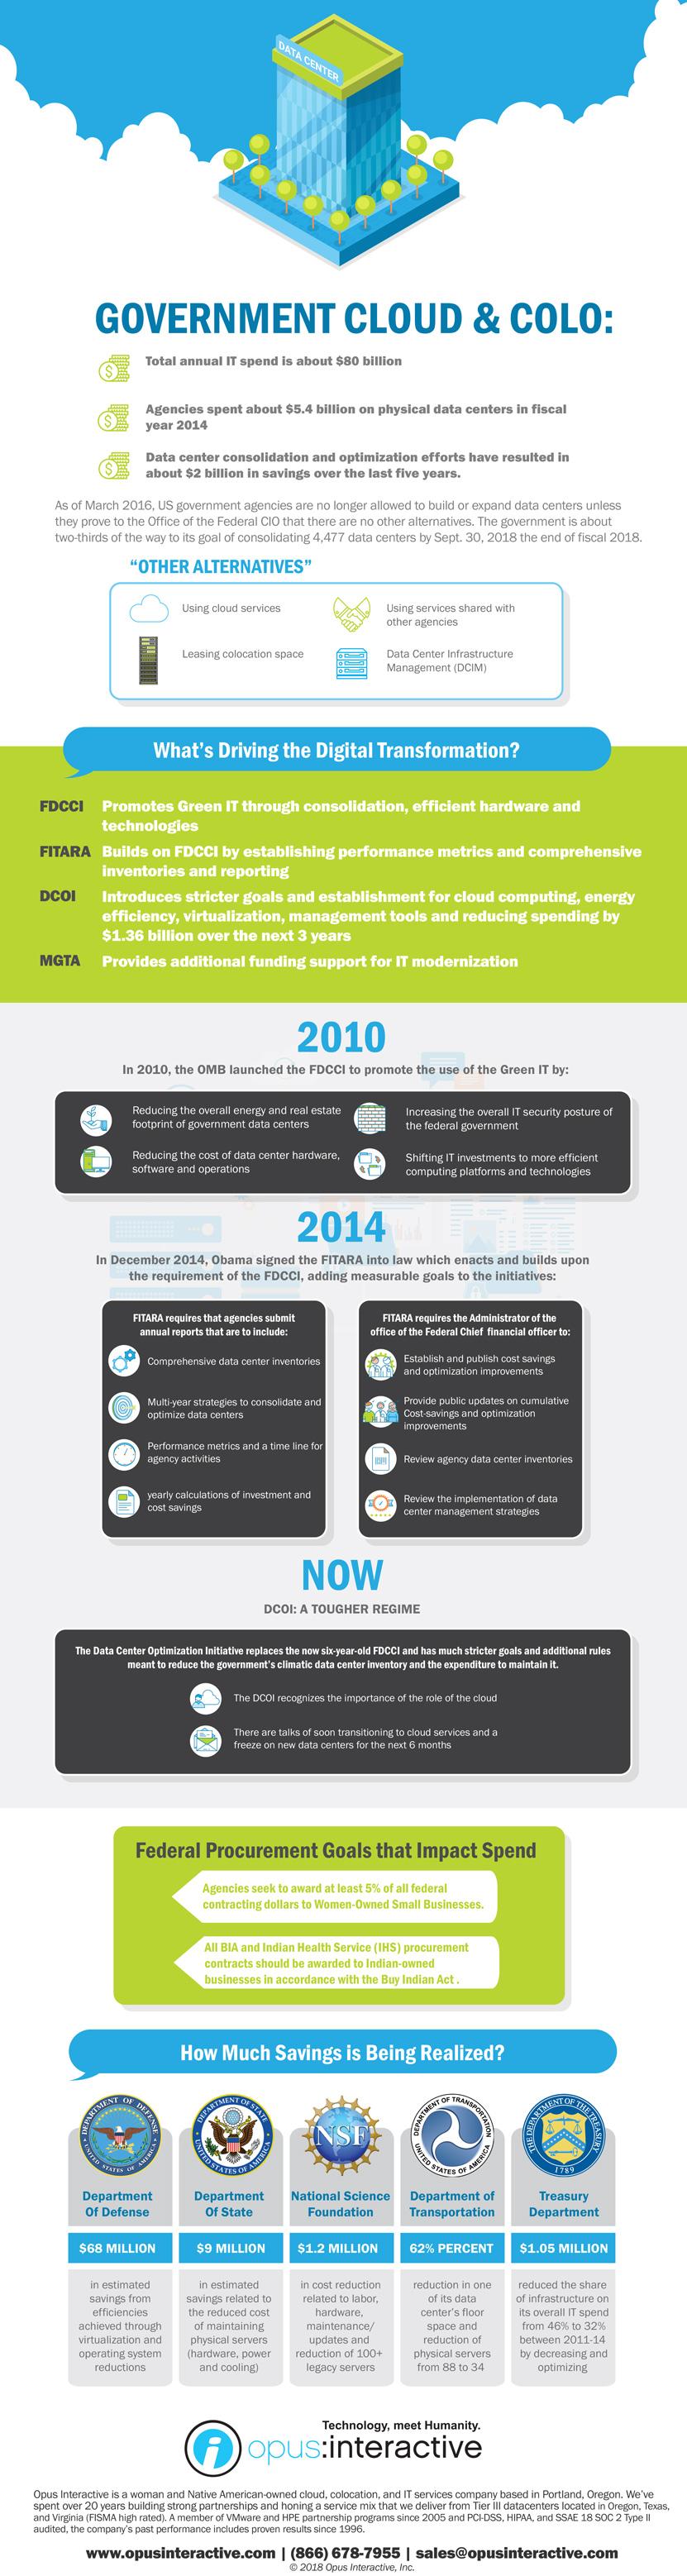 Government Modernization Intiatives